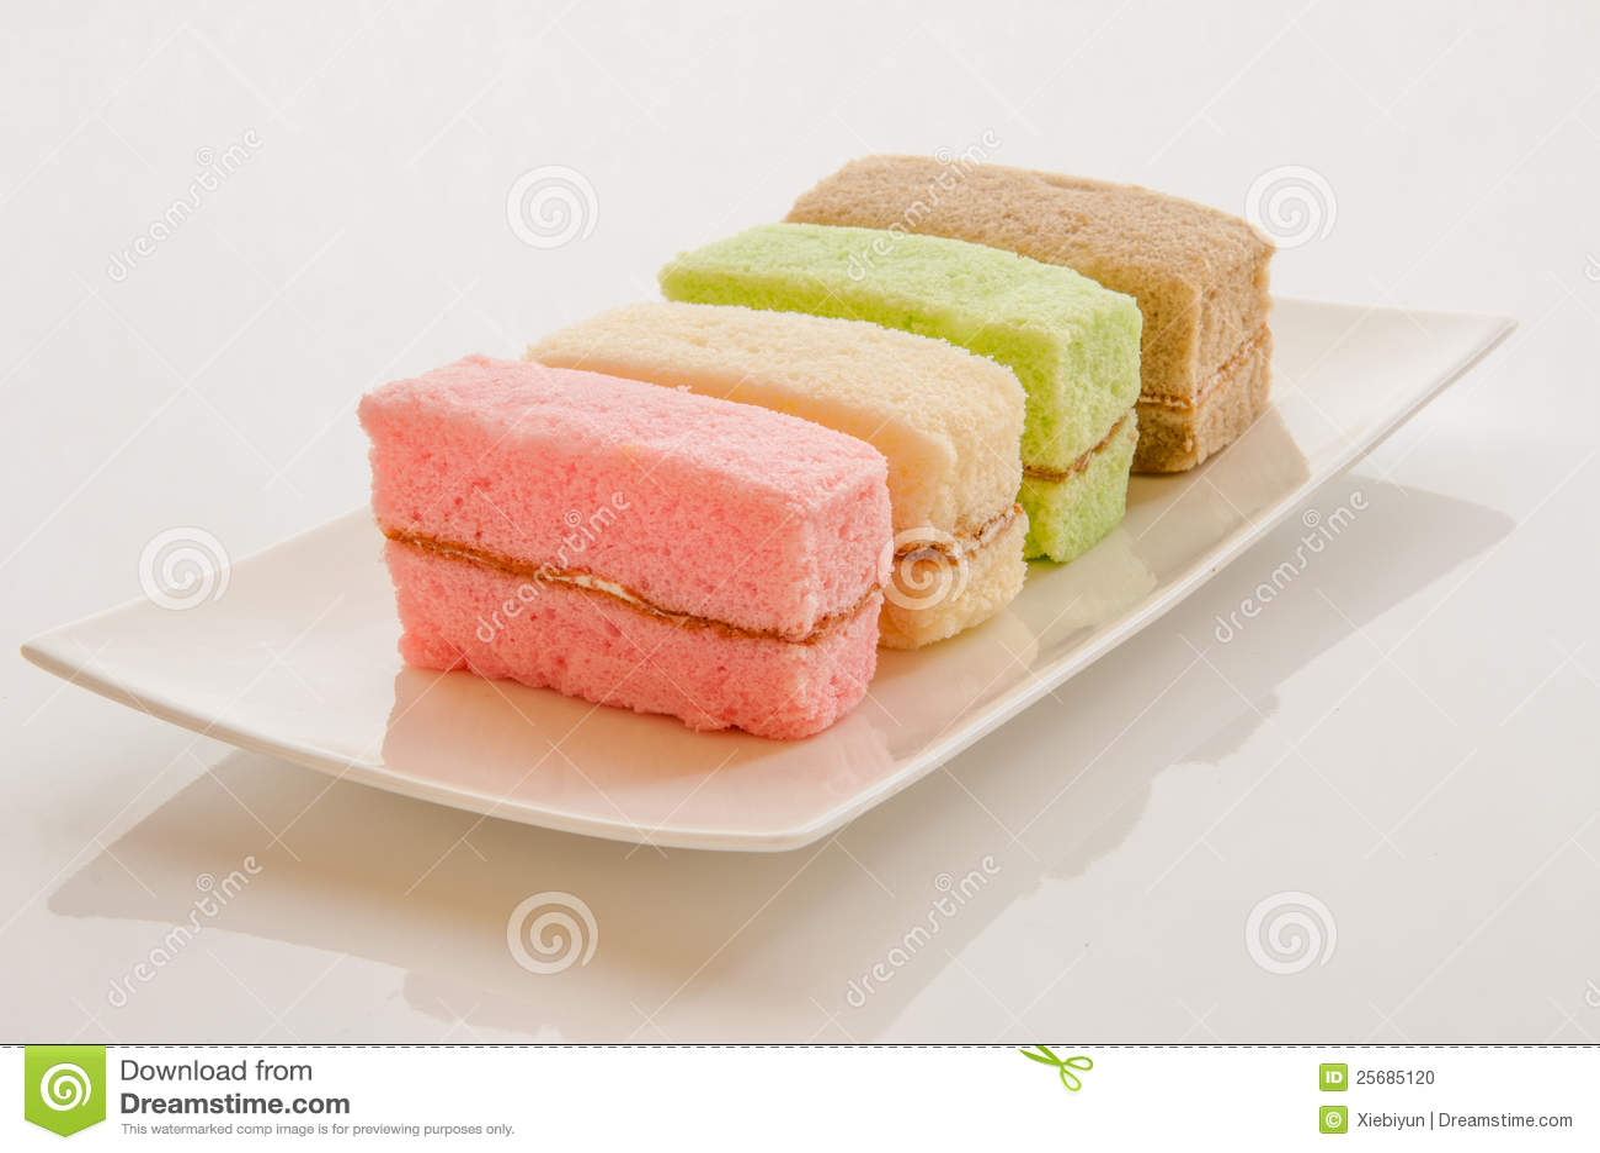 Green Tea Chiffon Cake Calories